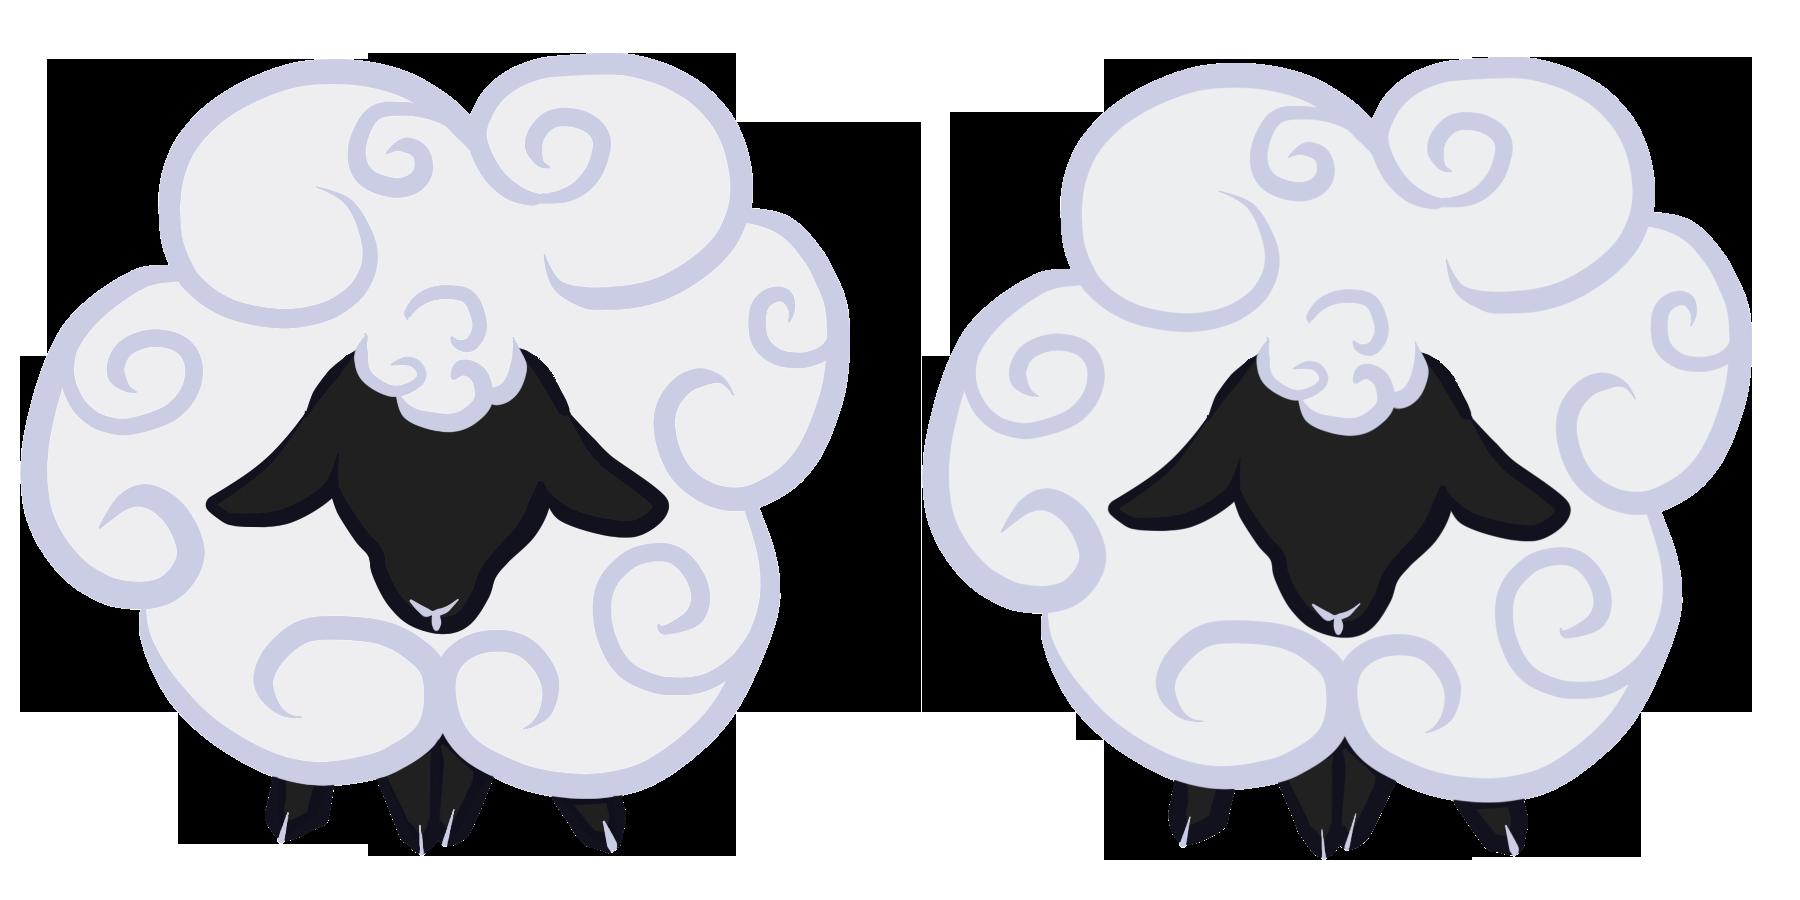 sheep_ui.png